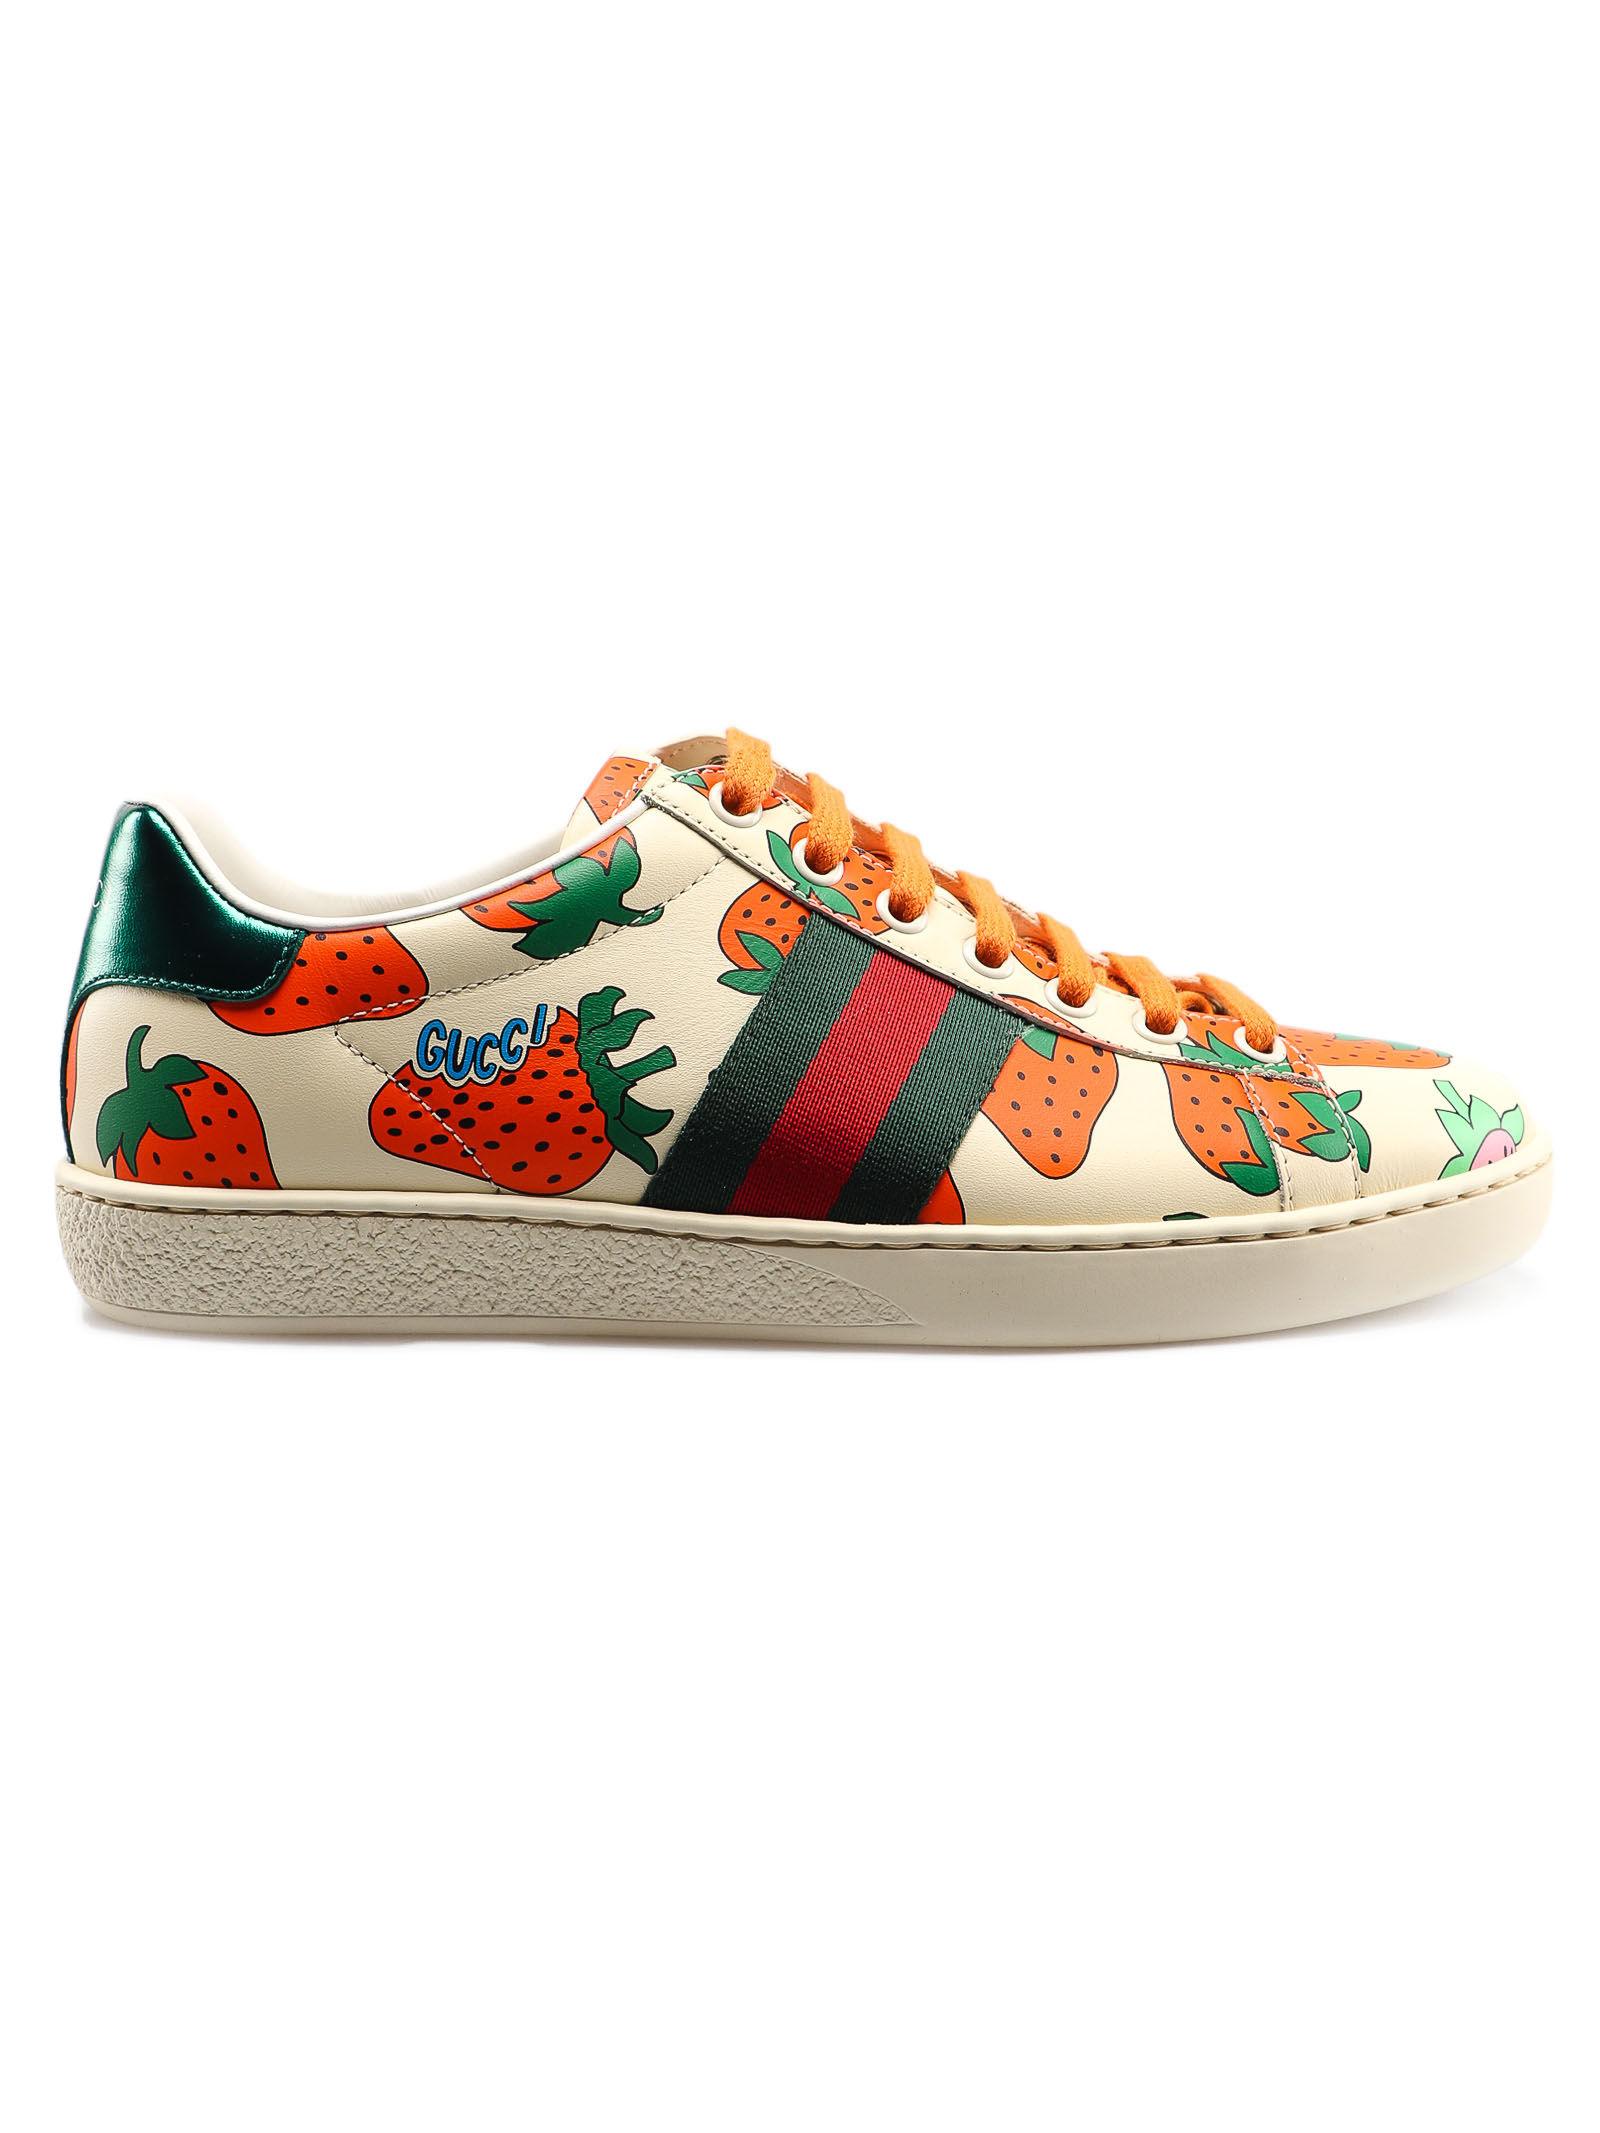 Gucci Sneaker Leather 387993/08L30